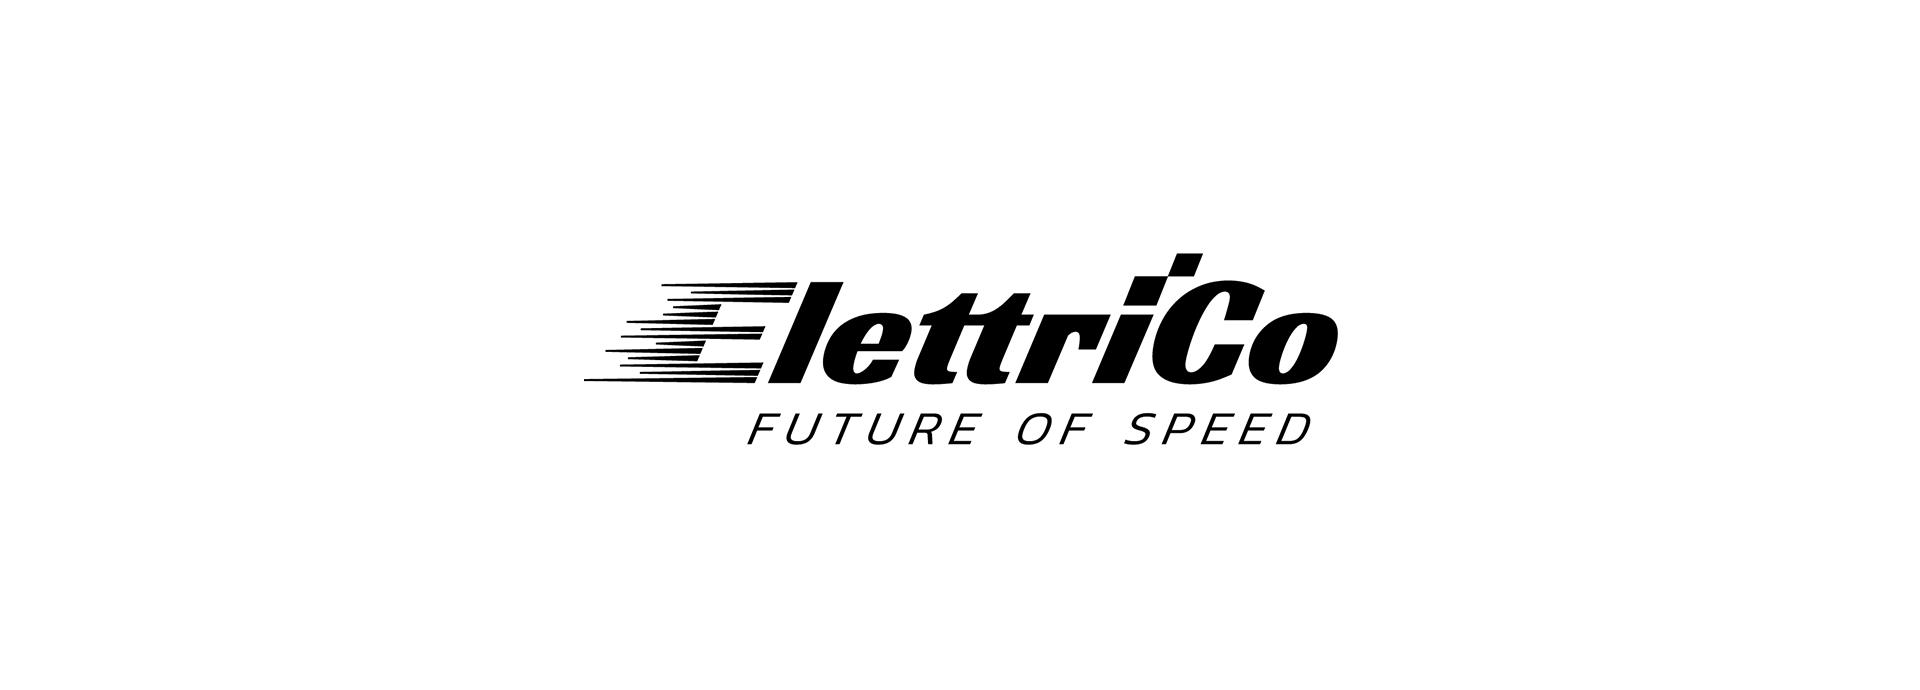 logo startup elettrico nero